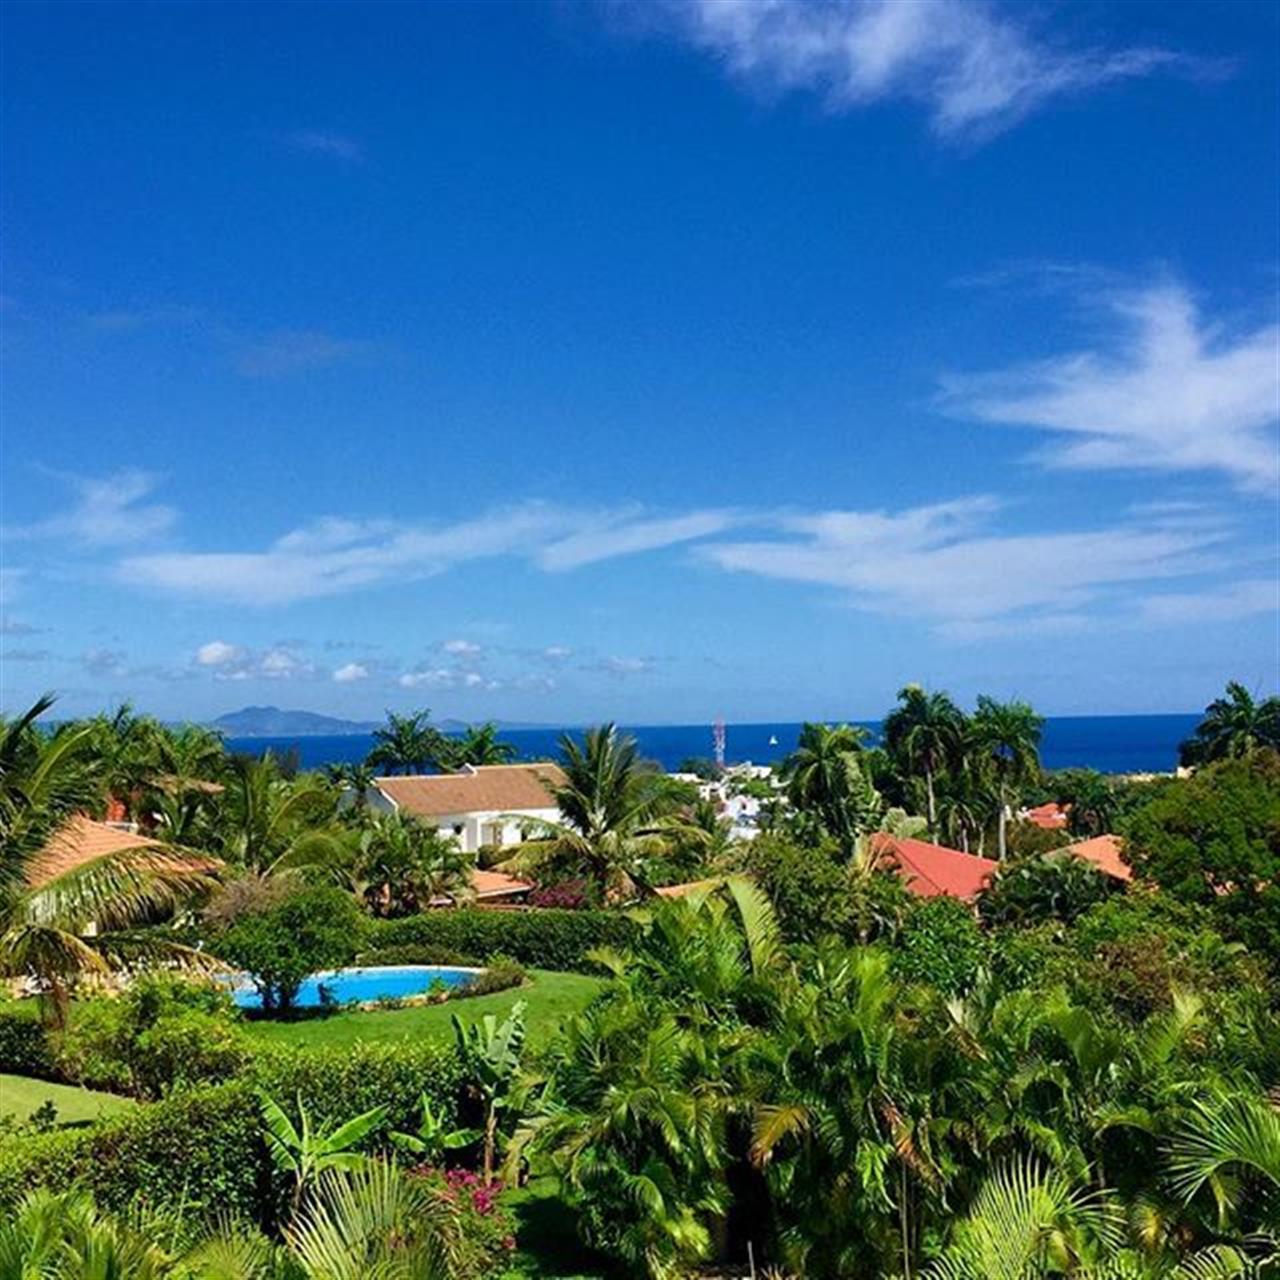 Residential Development #realestate #Sosua #dominicanrepublic #sosuabeach #privatevilla #oceanviews #homesforsale #leadingrelocal #selectcaribbeanproperties www.selectcaribbean.com